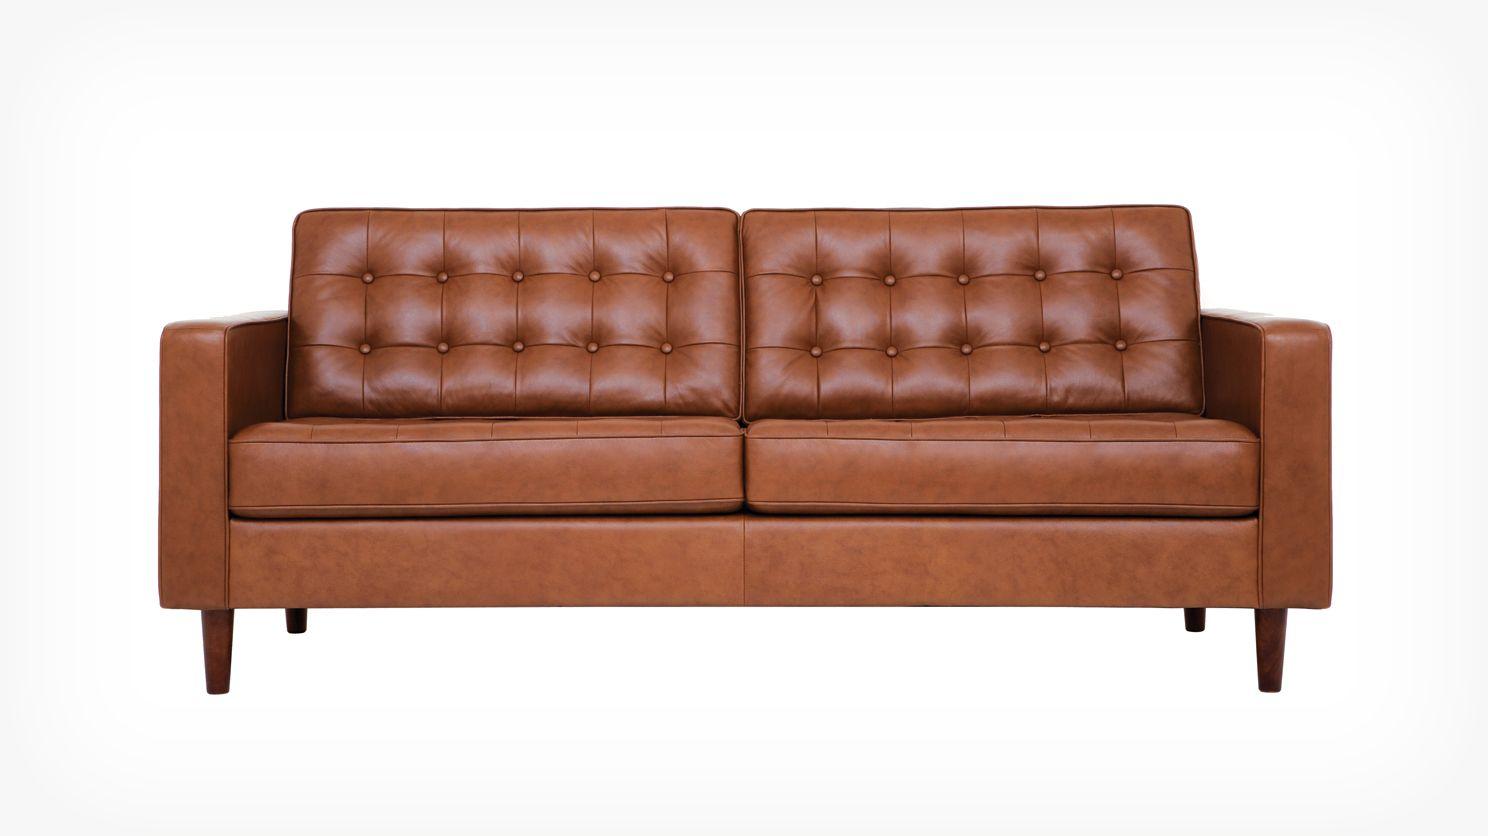 Reverie Apartment Sofa Leather Sofa Classic Sofa Apartment Sofa